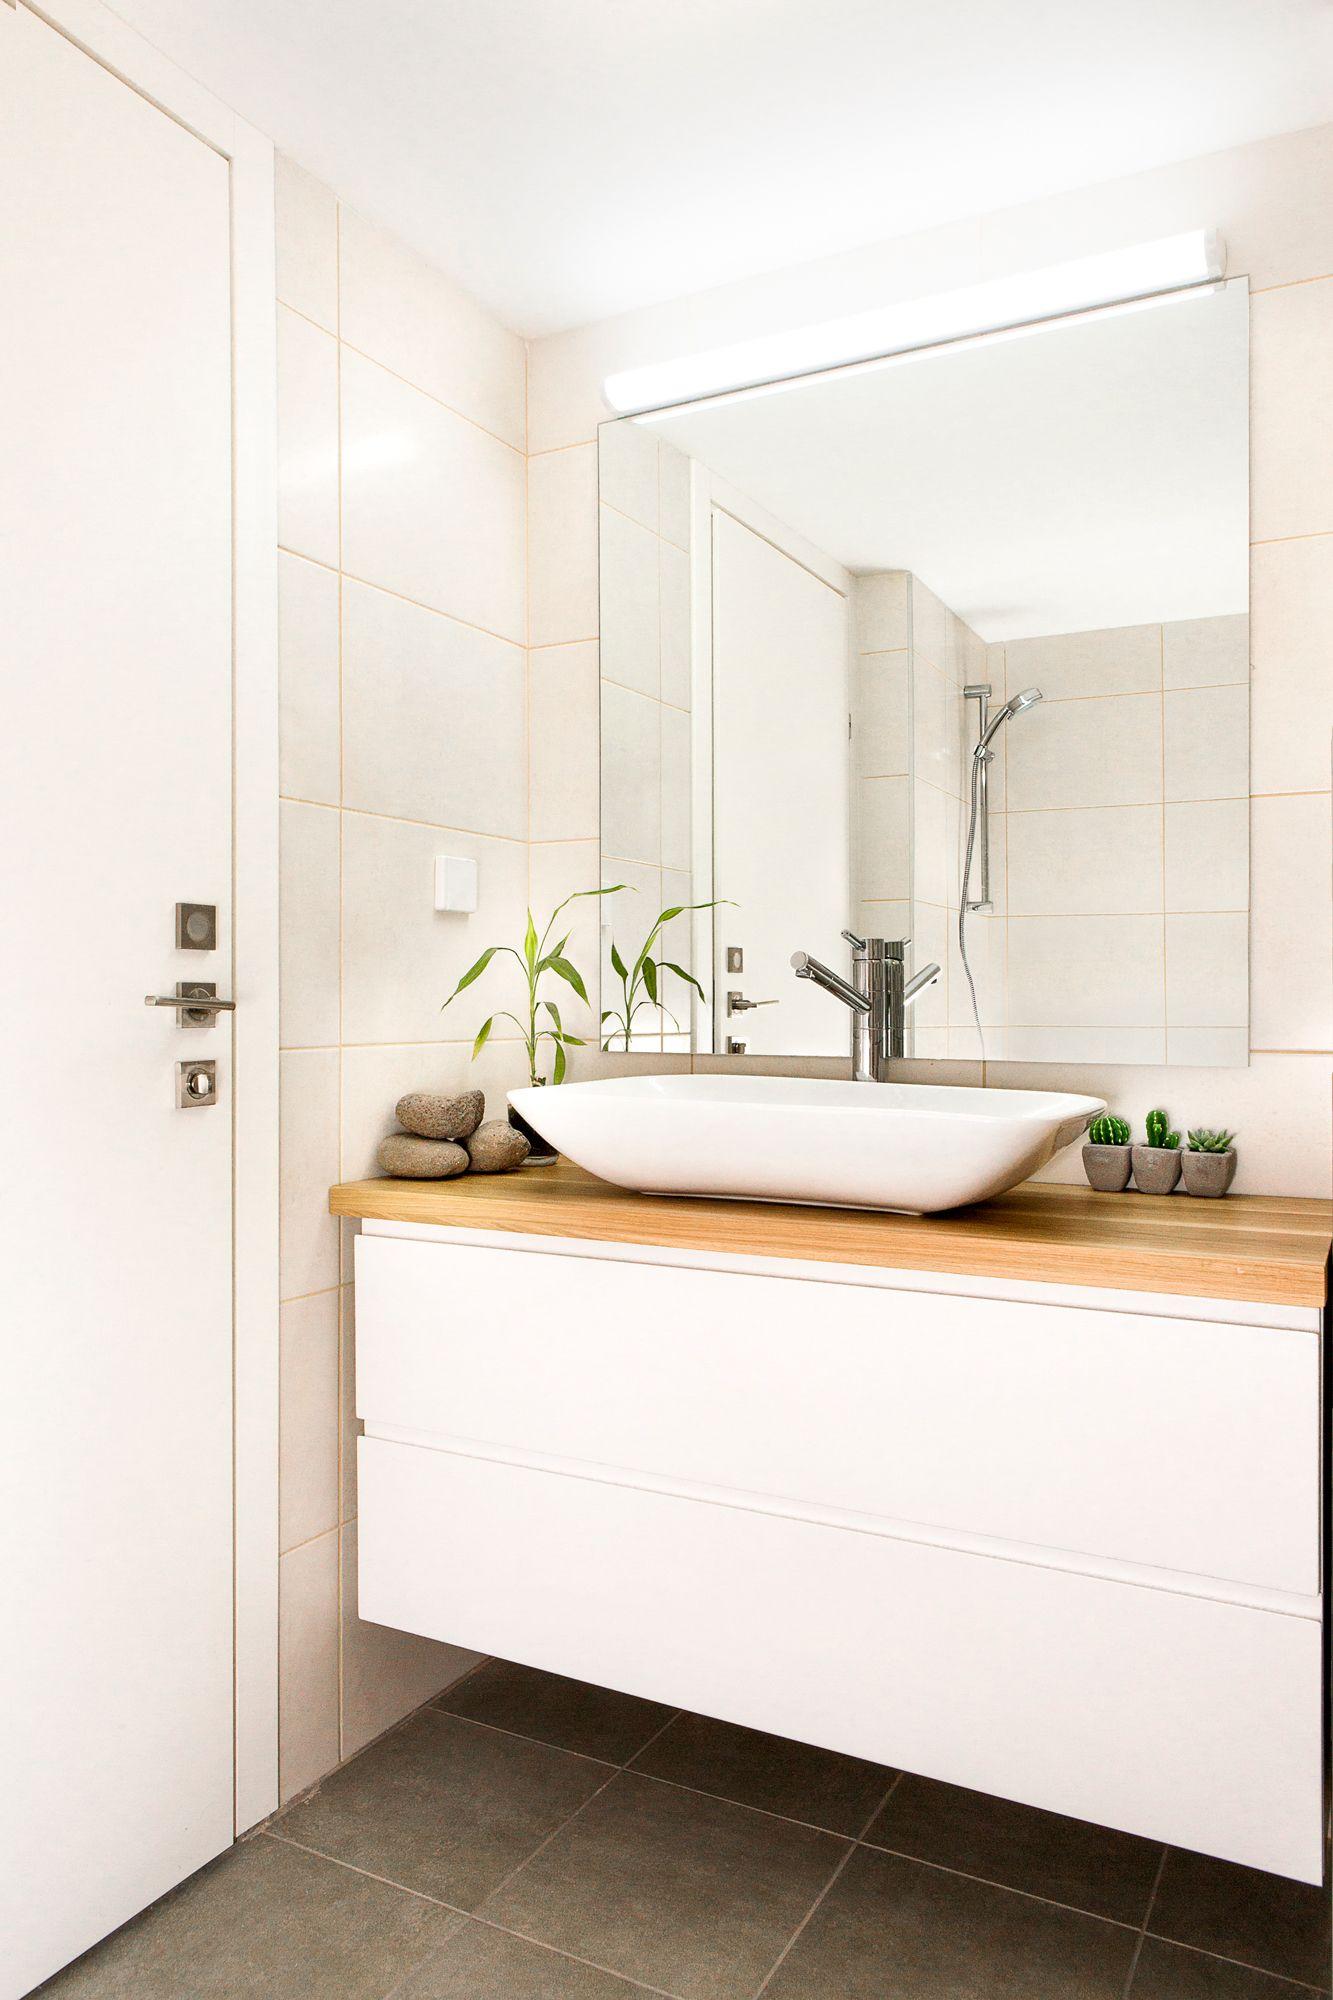 white bathroom Cabinet | דירת קבלן / Apartment design | Pinterest ...